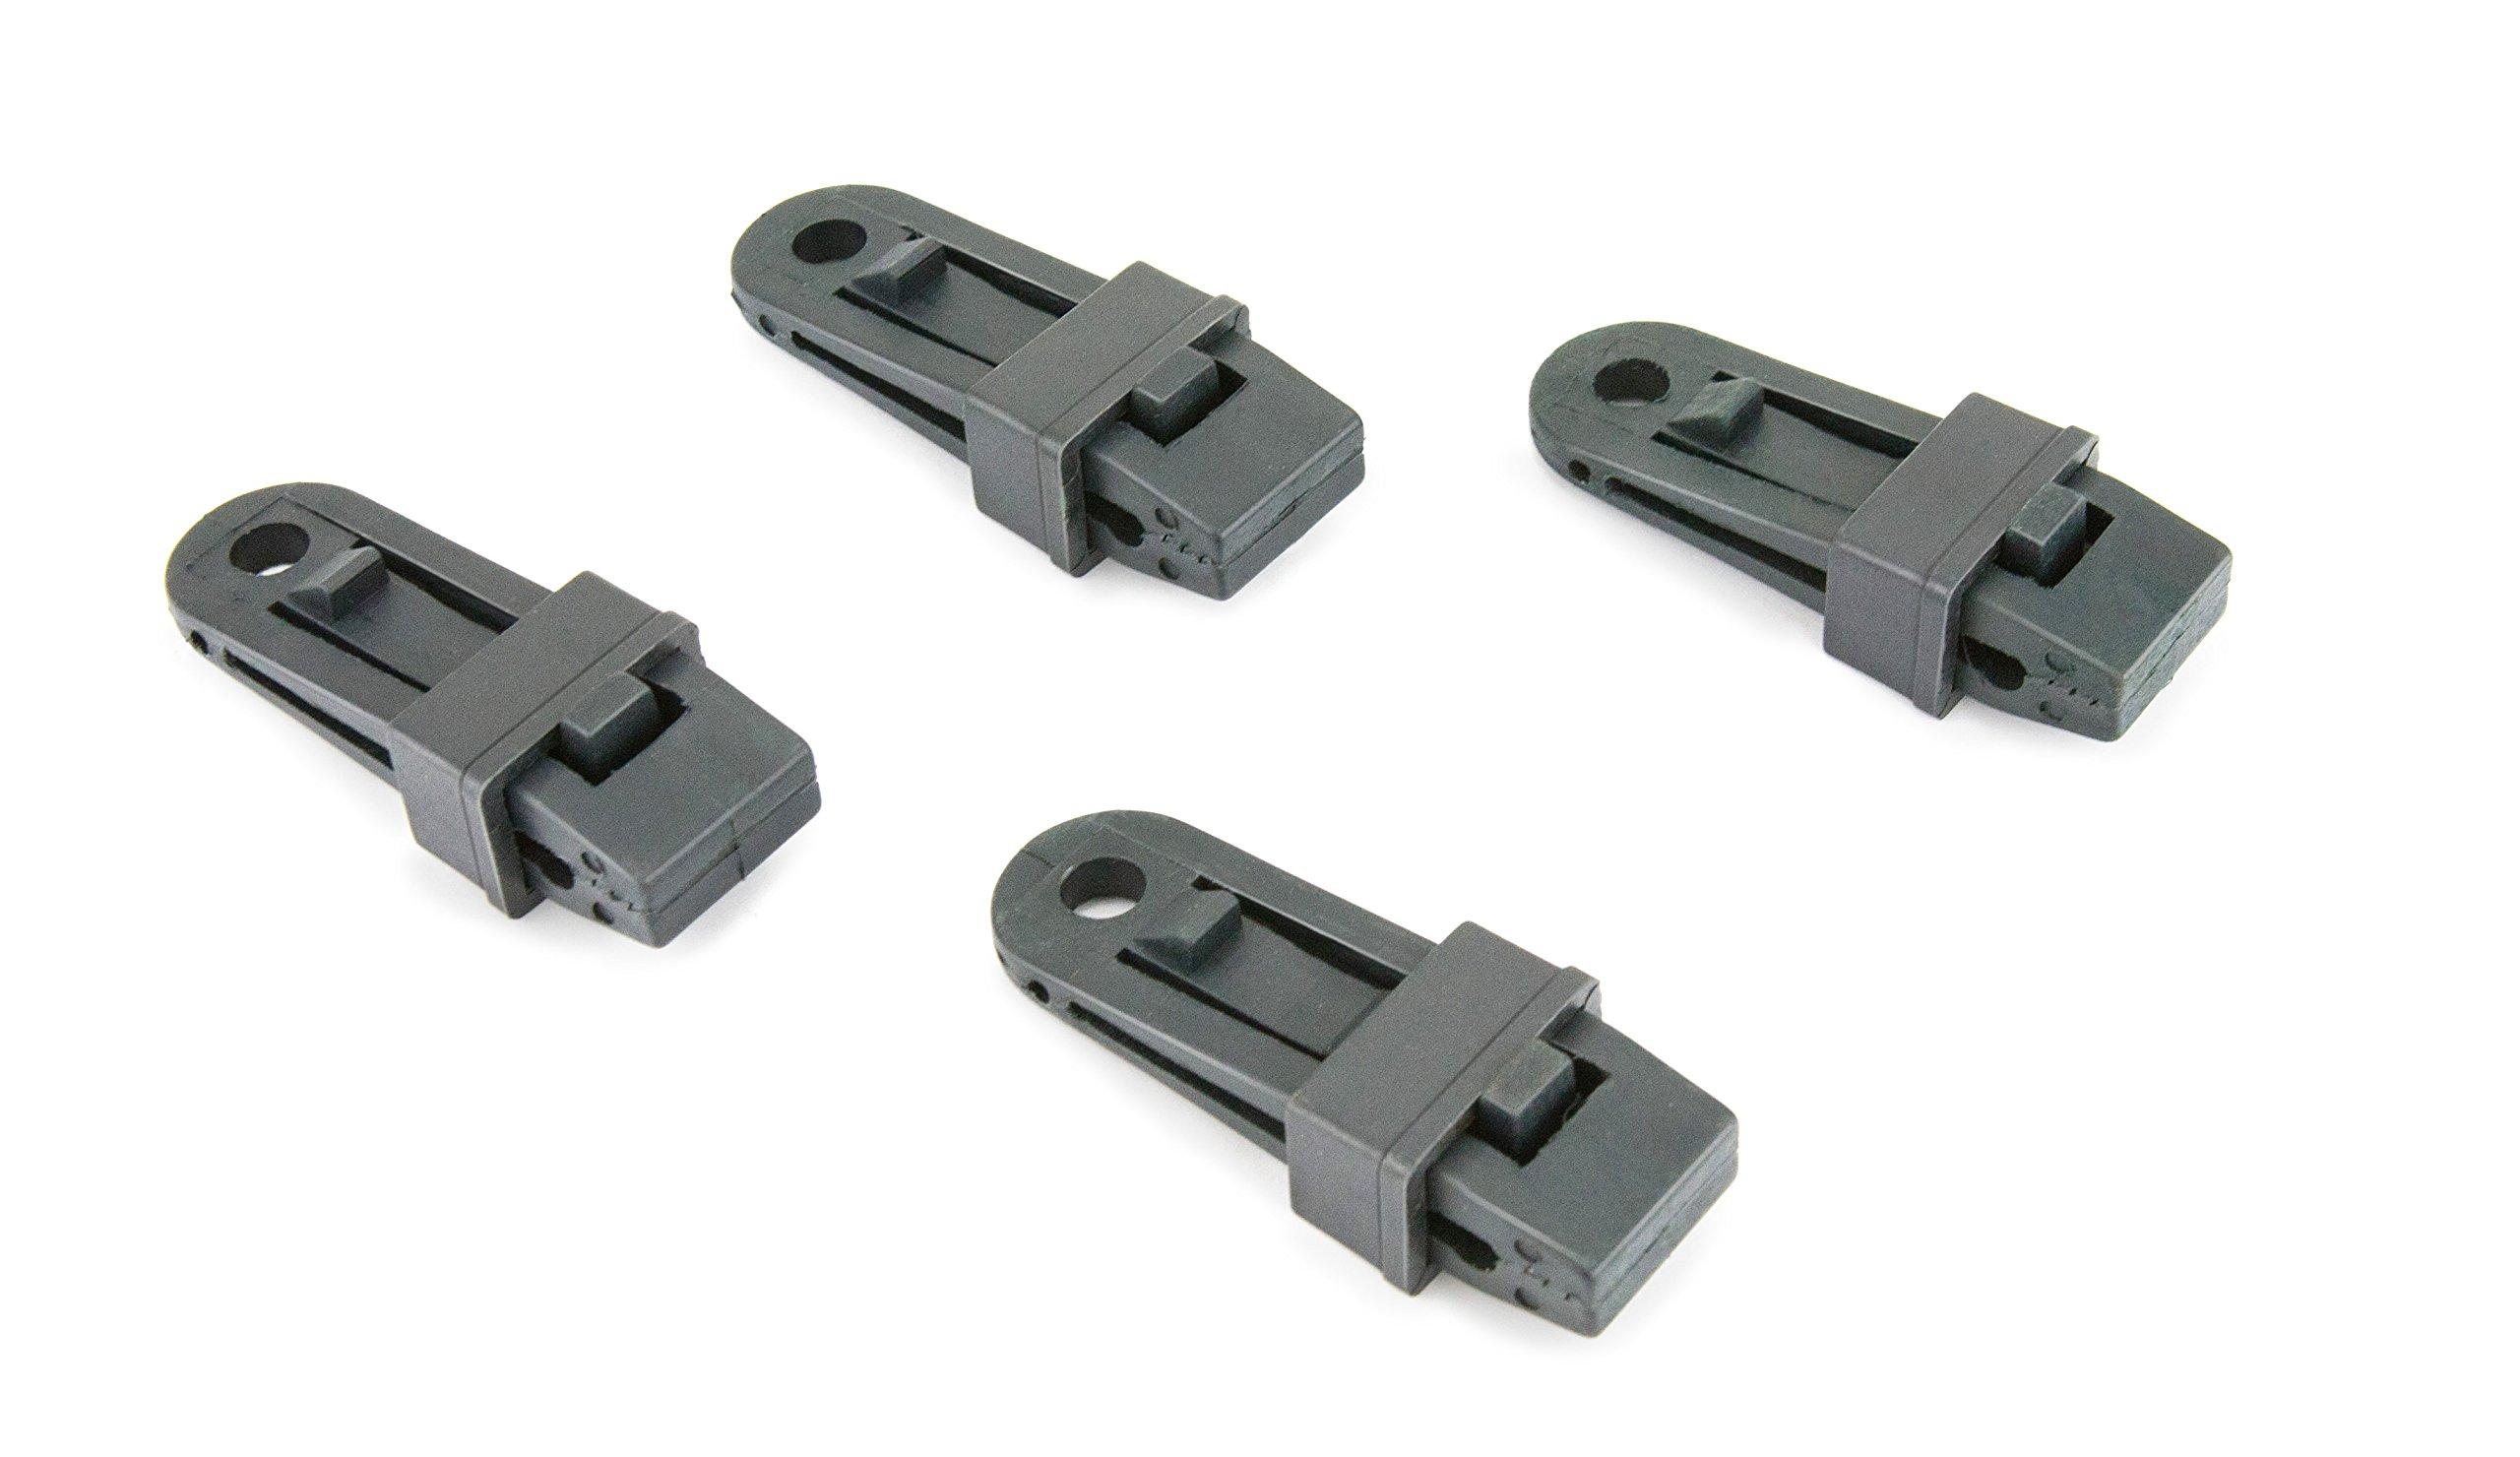 Reese Secure 9429400 Black Tarp Clip, 4 pack